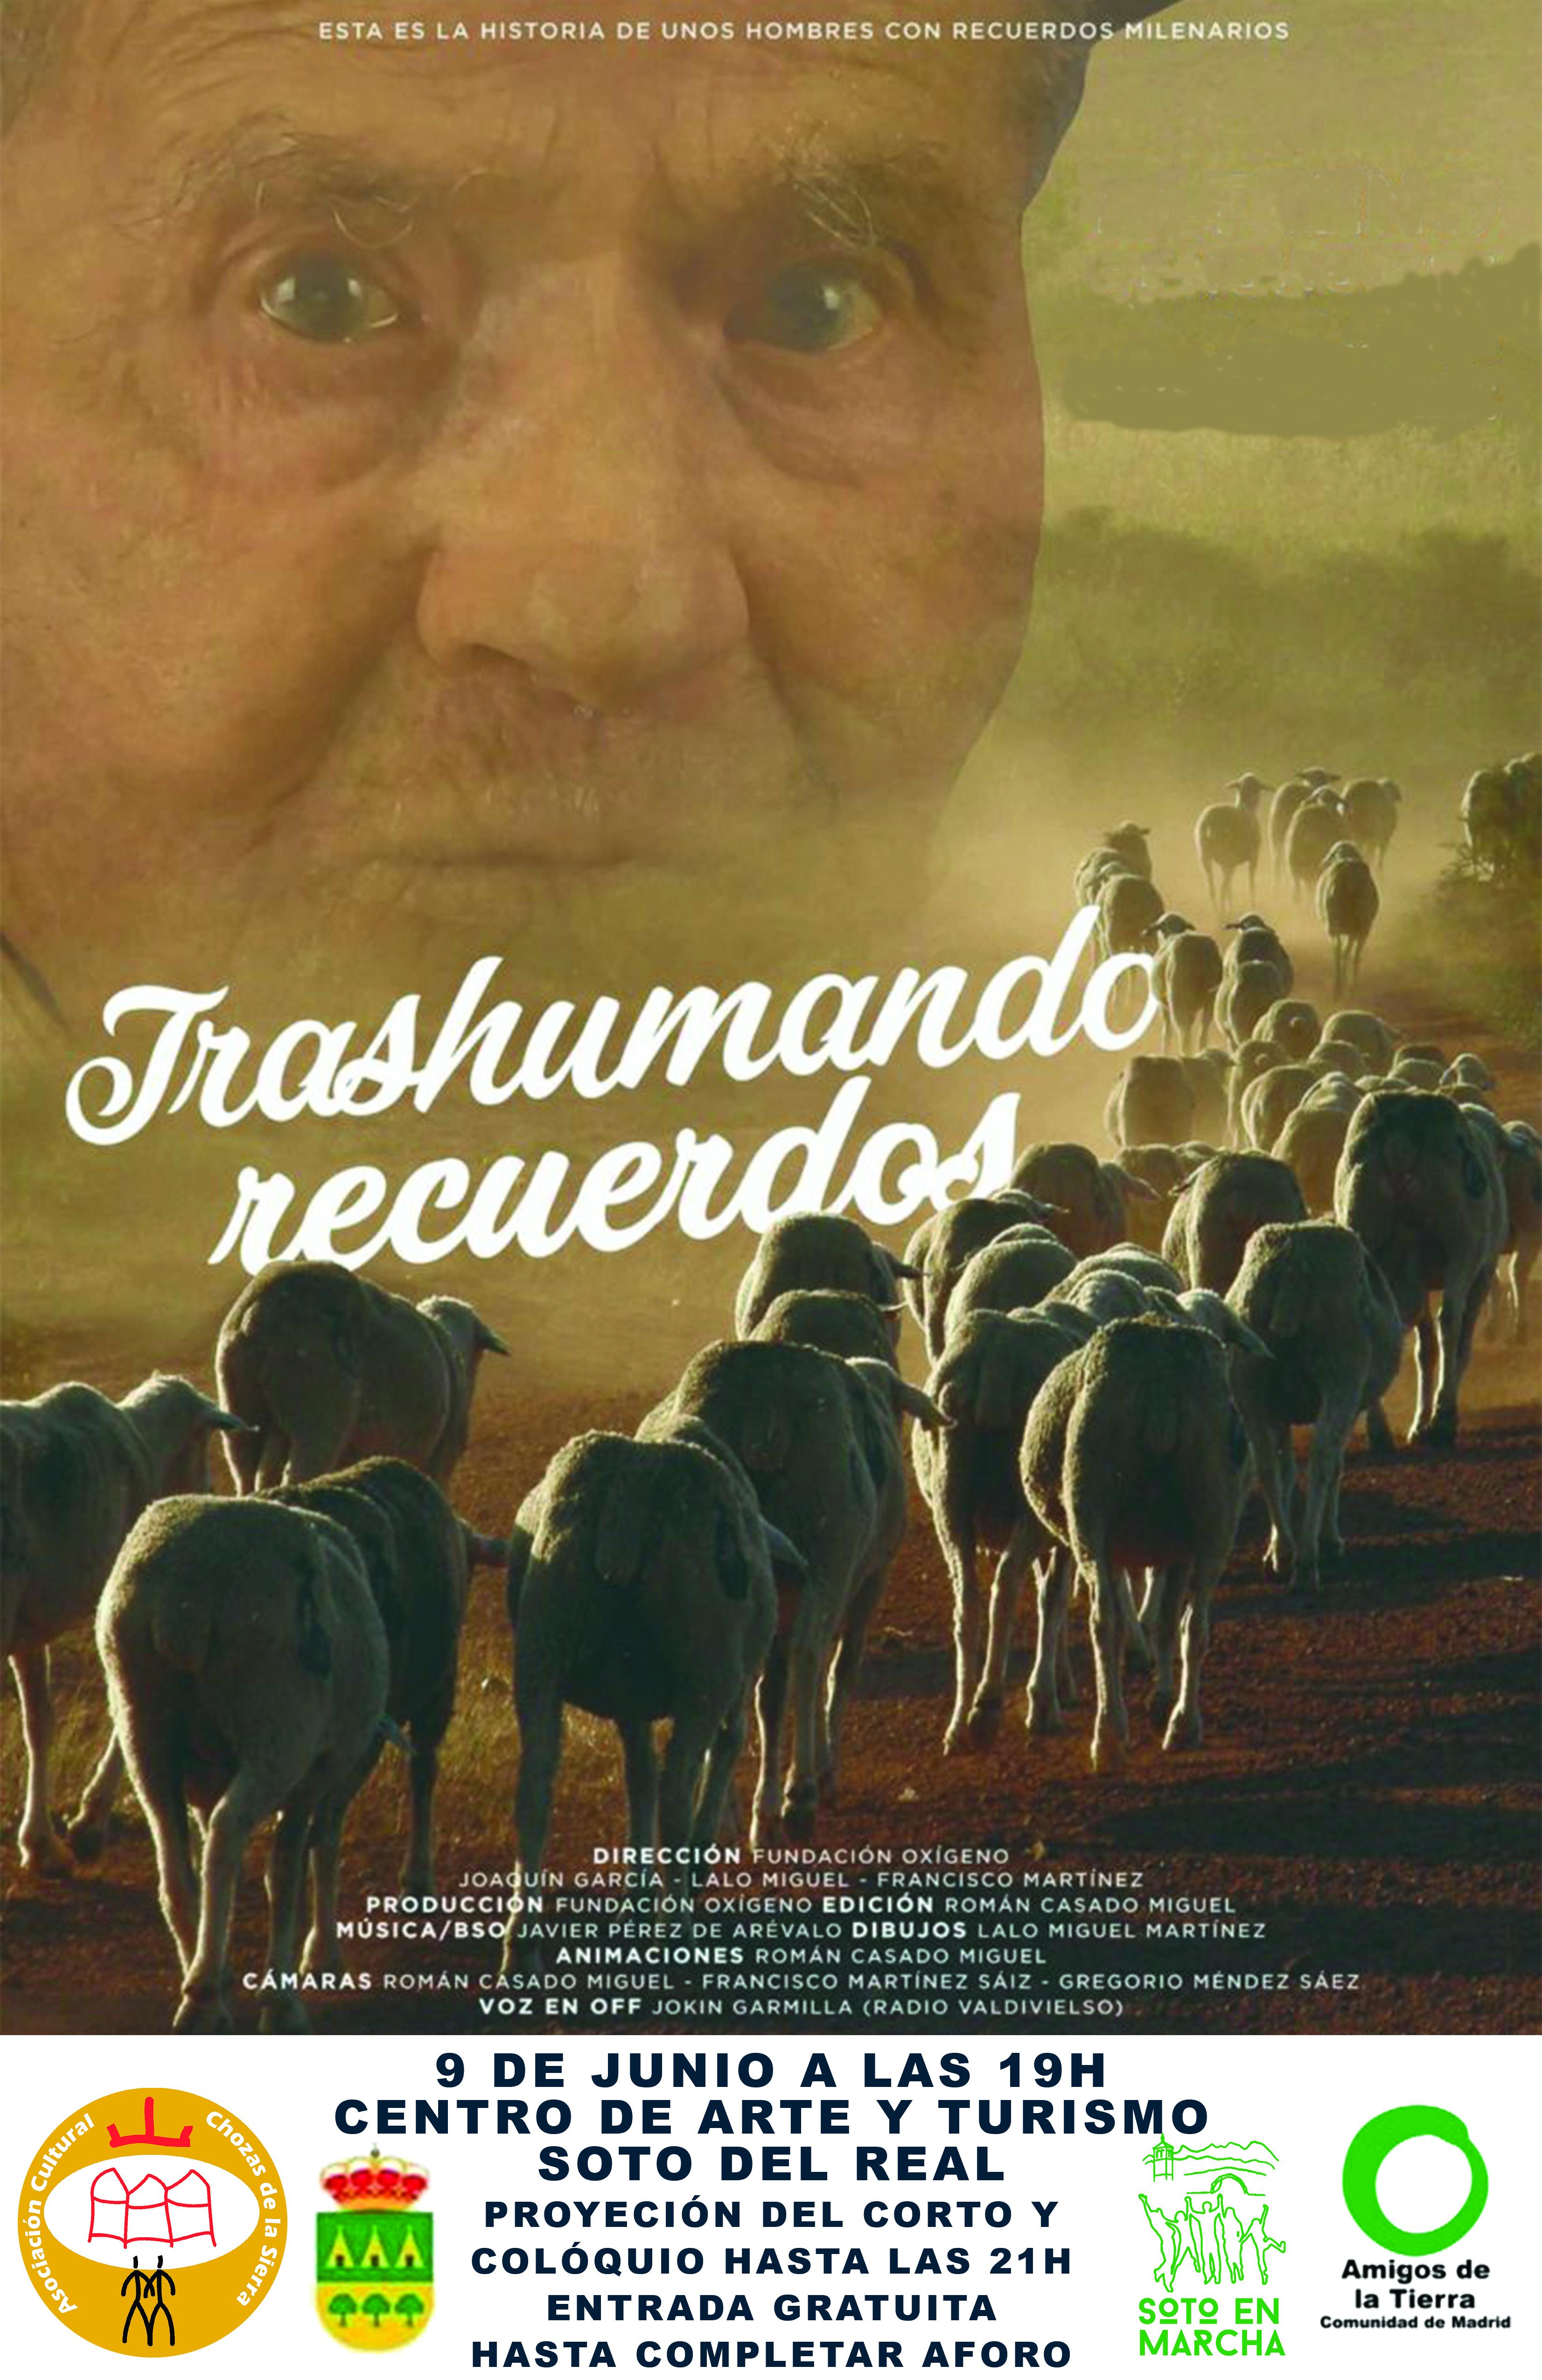 Ir a Madrid: Trashumando Recuerdos